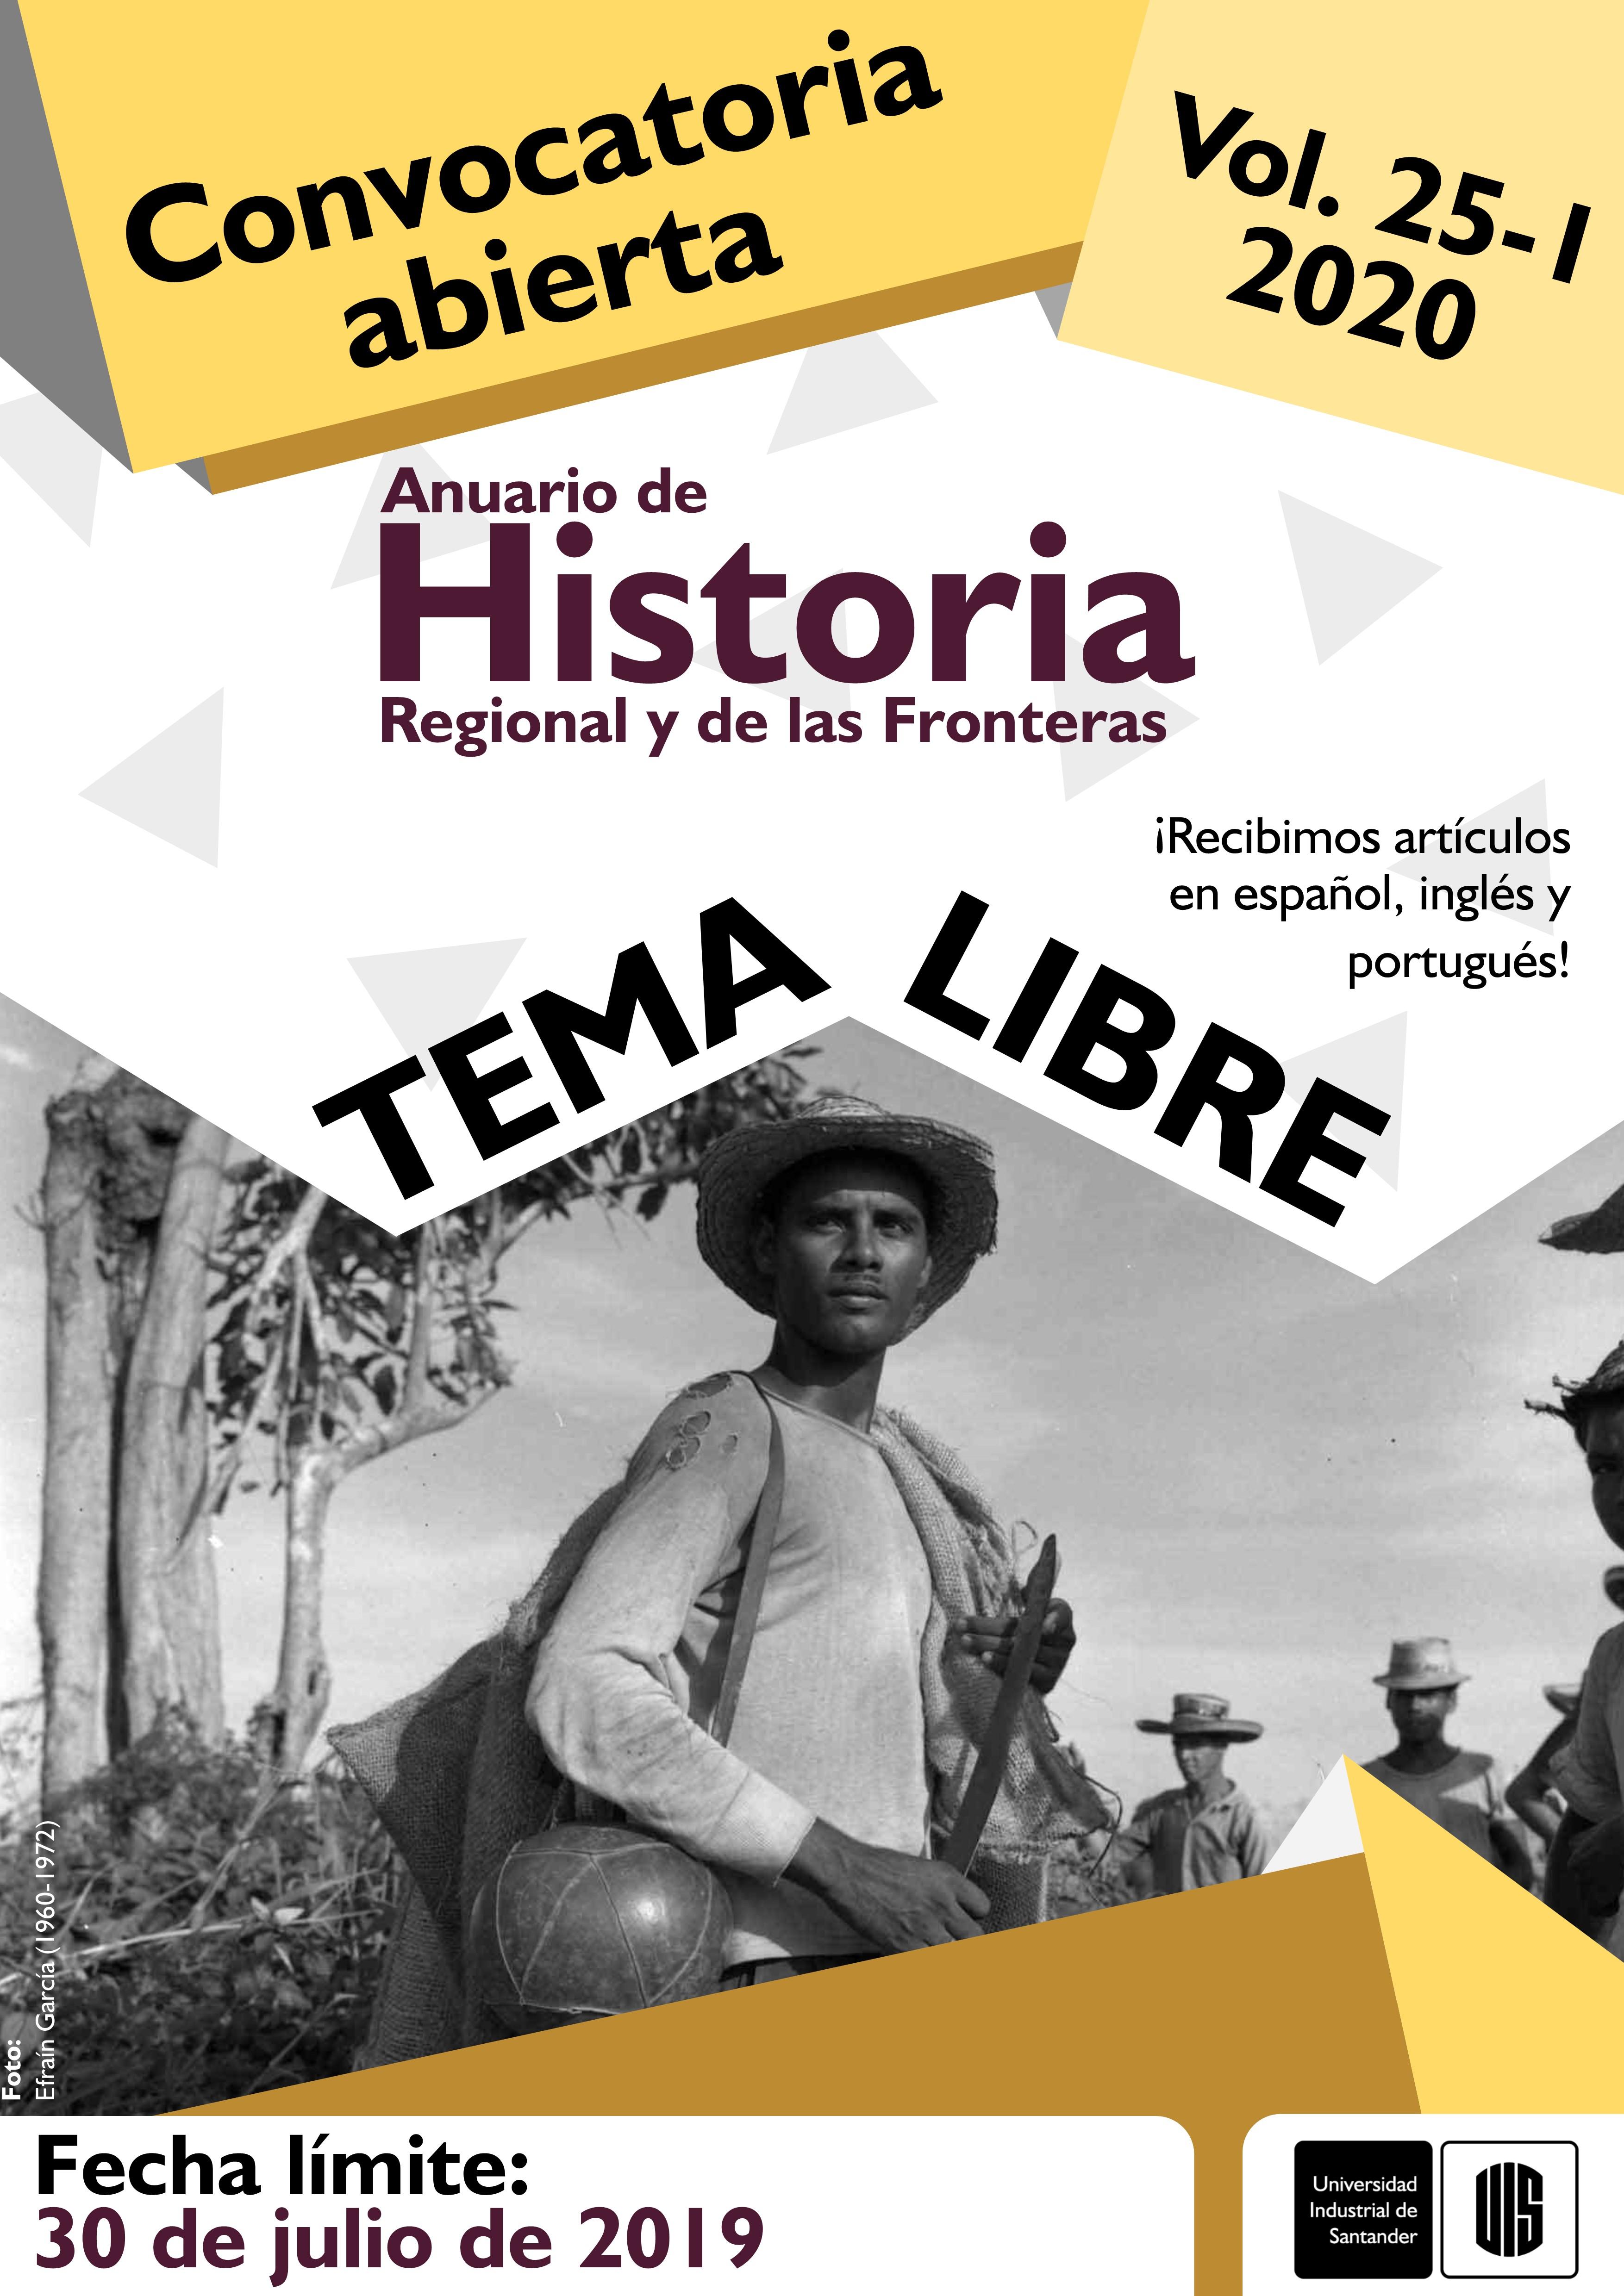 Vol._25_.Tema_.libre_1.jpg